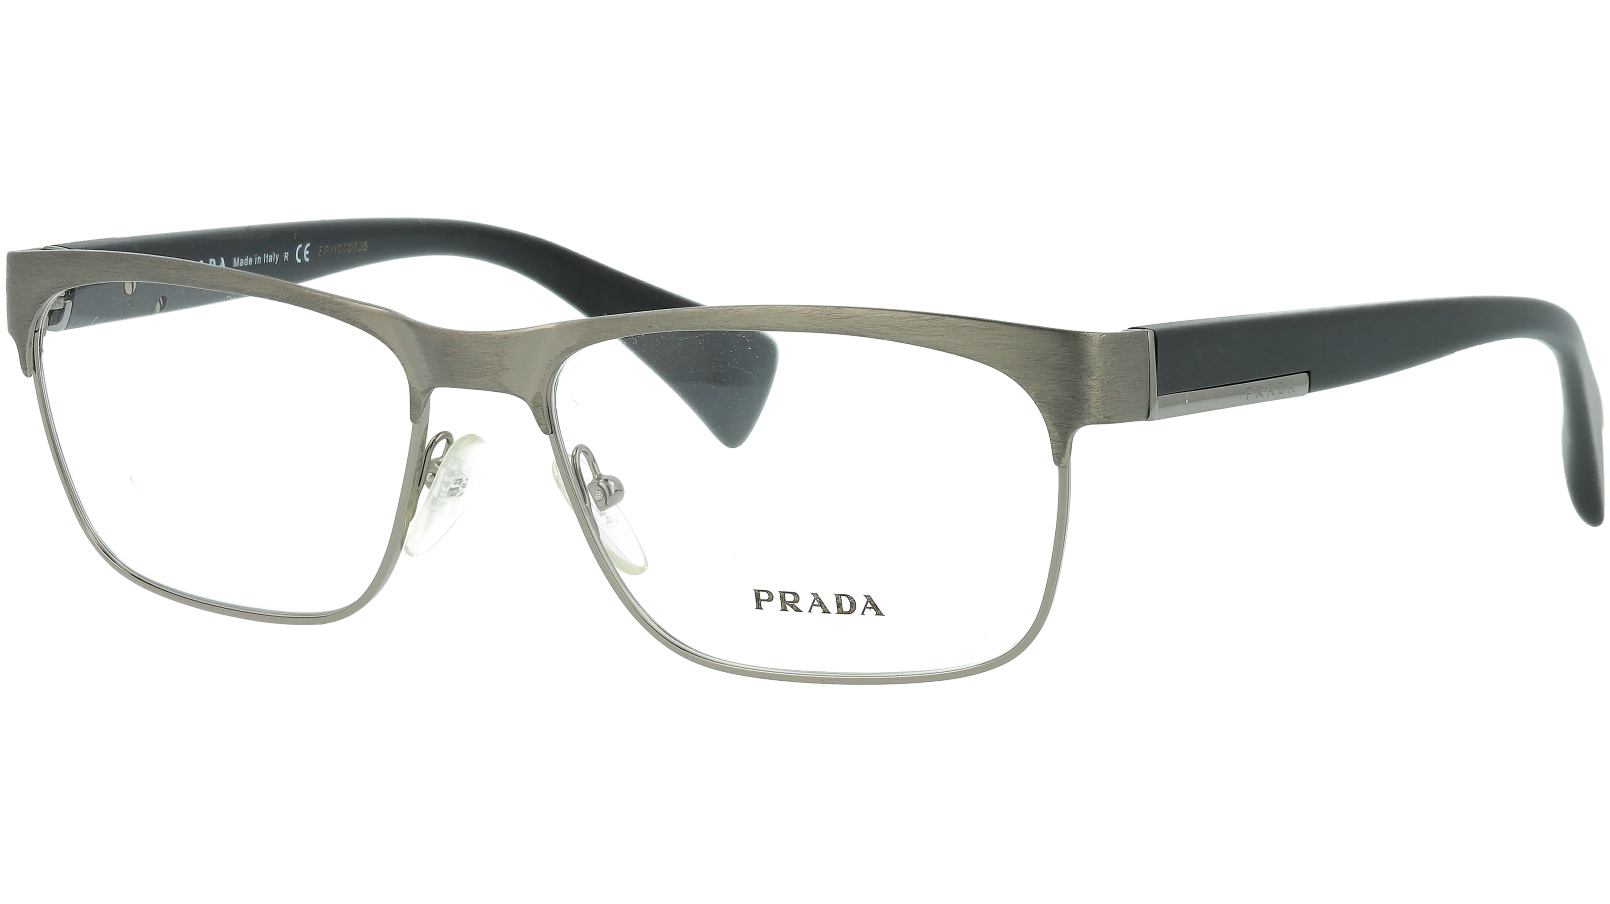 Prada PR61PV DHG1O1 55 GUNMETAL Glasses